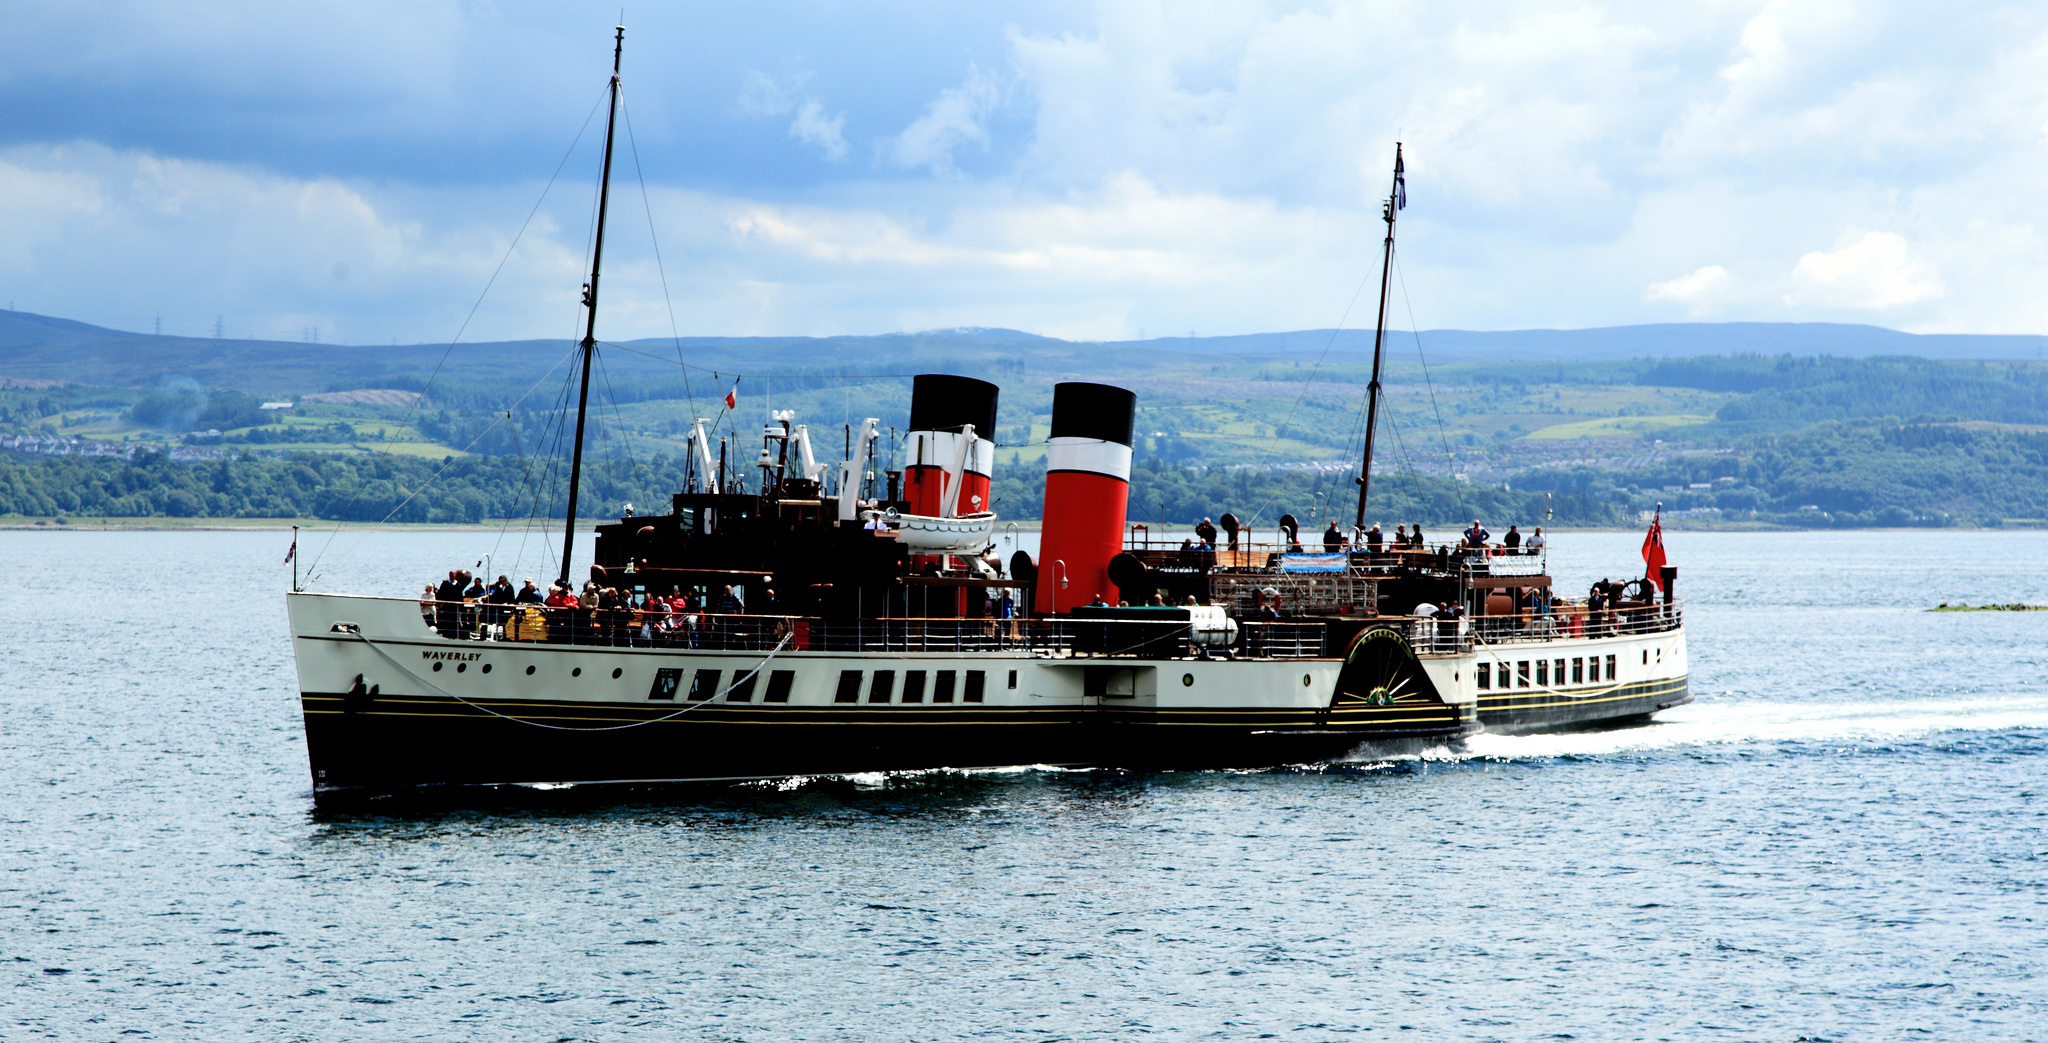 paddle steamer waverley